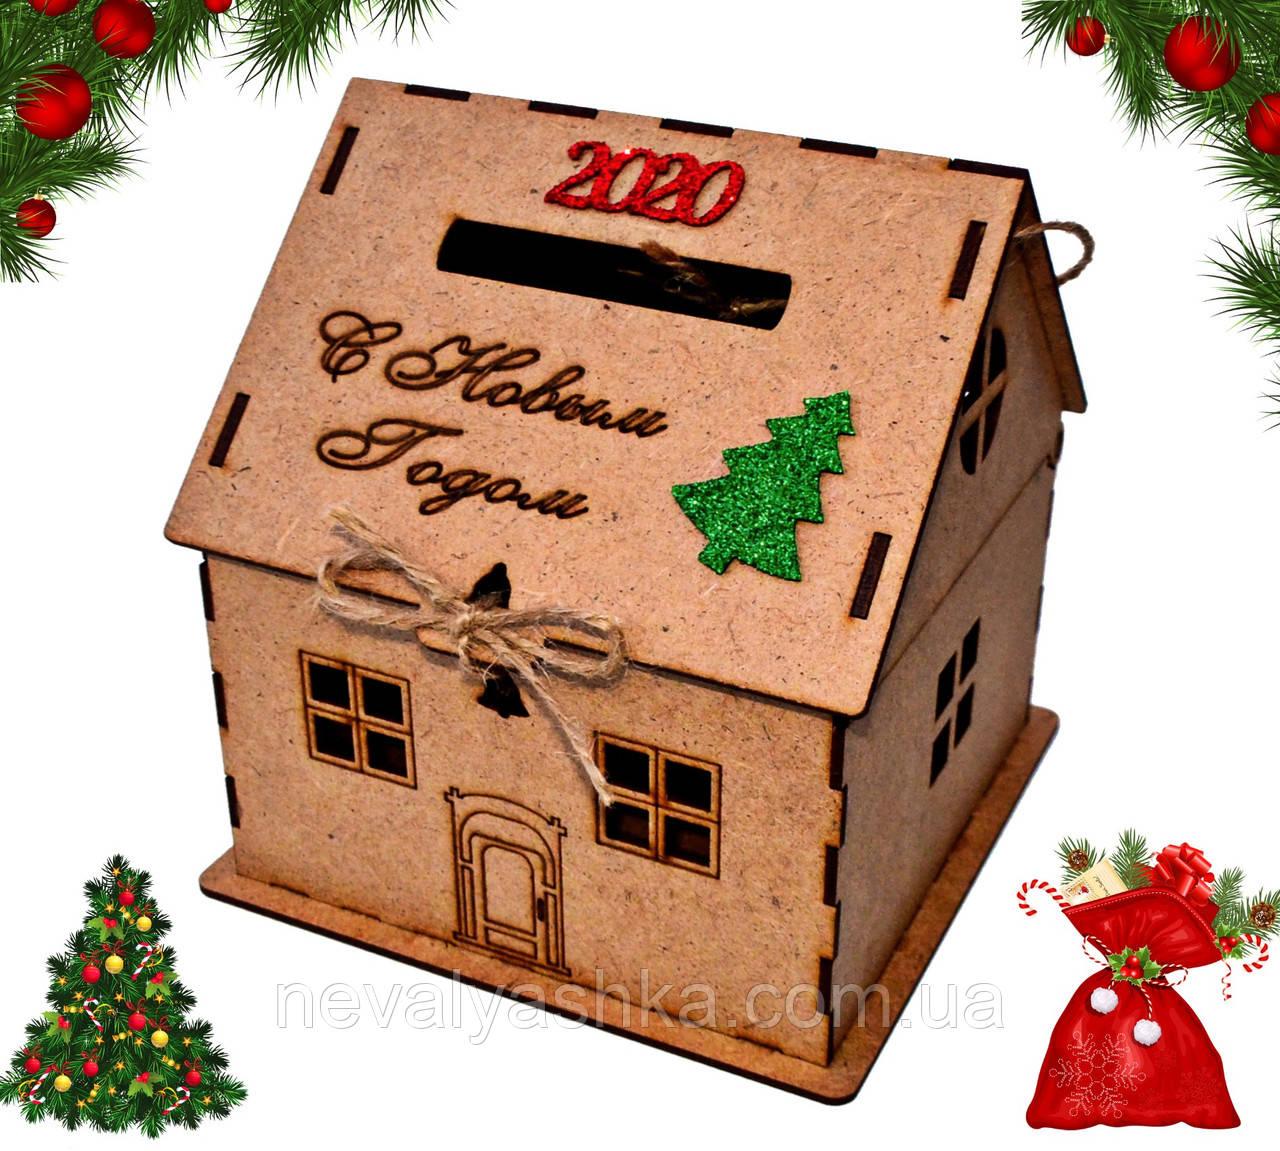 Новогодний Домик для Конфет 2021 Деревянный Копилка на Новый Год Будиночок для цукерок на Новий Рік